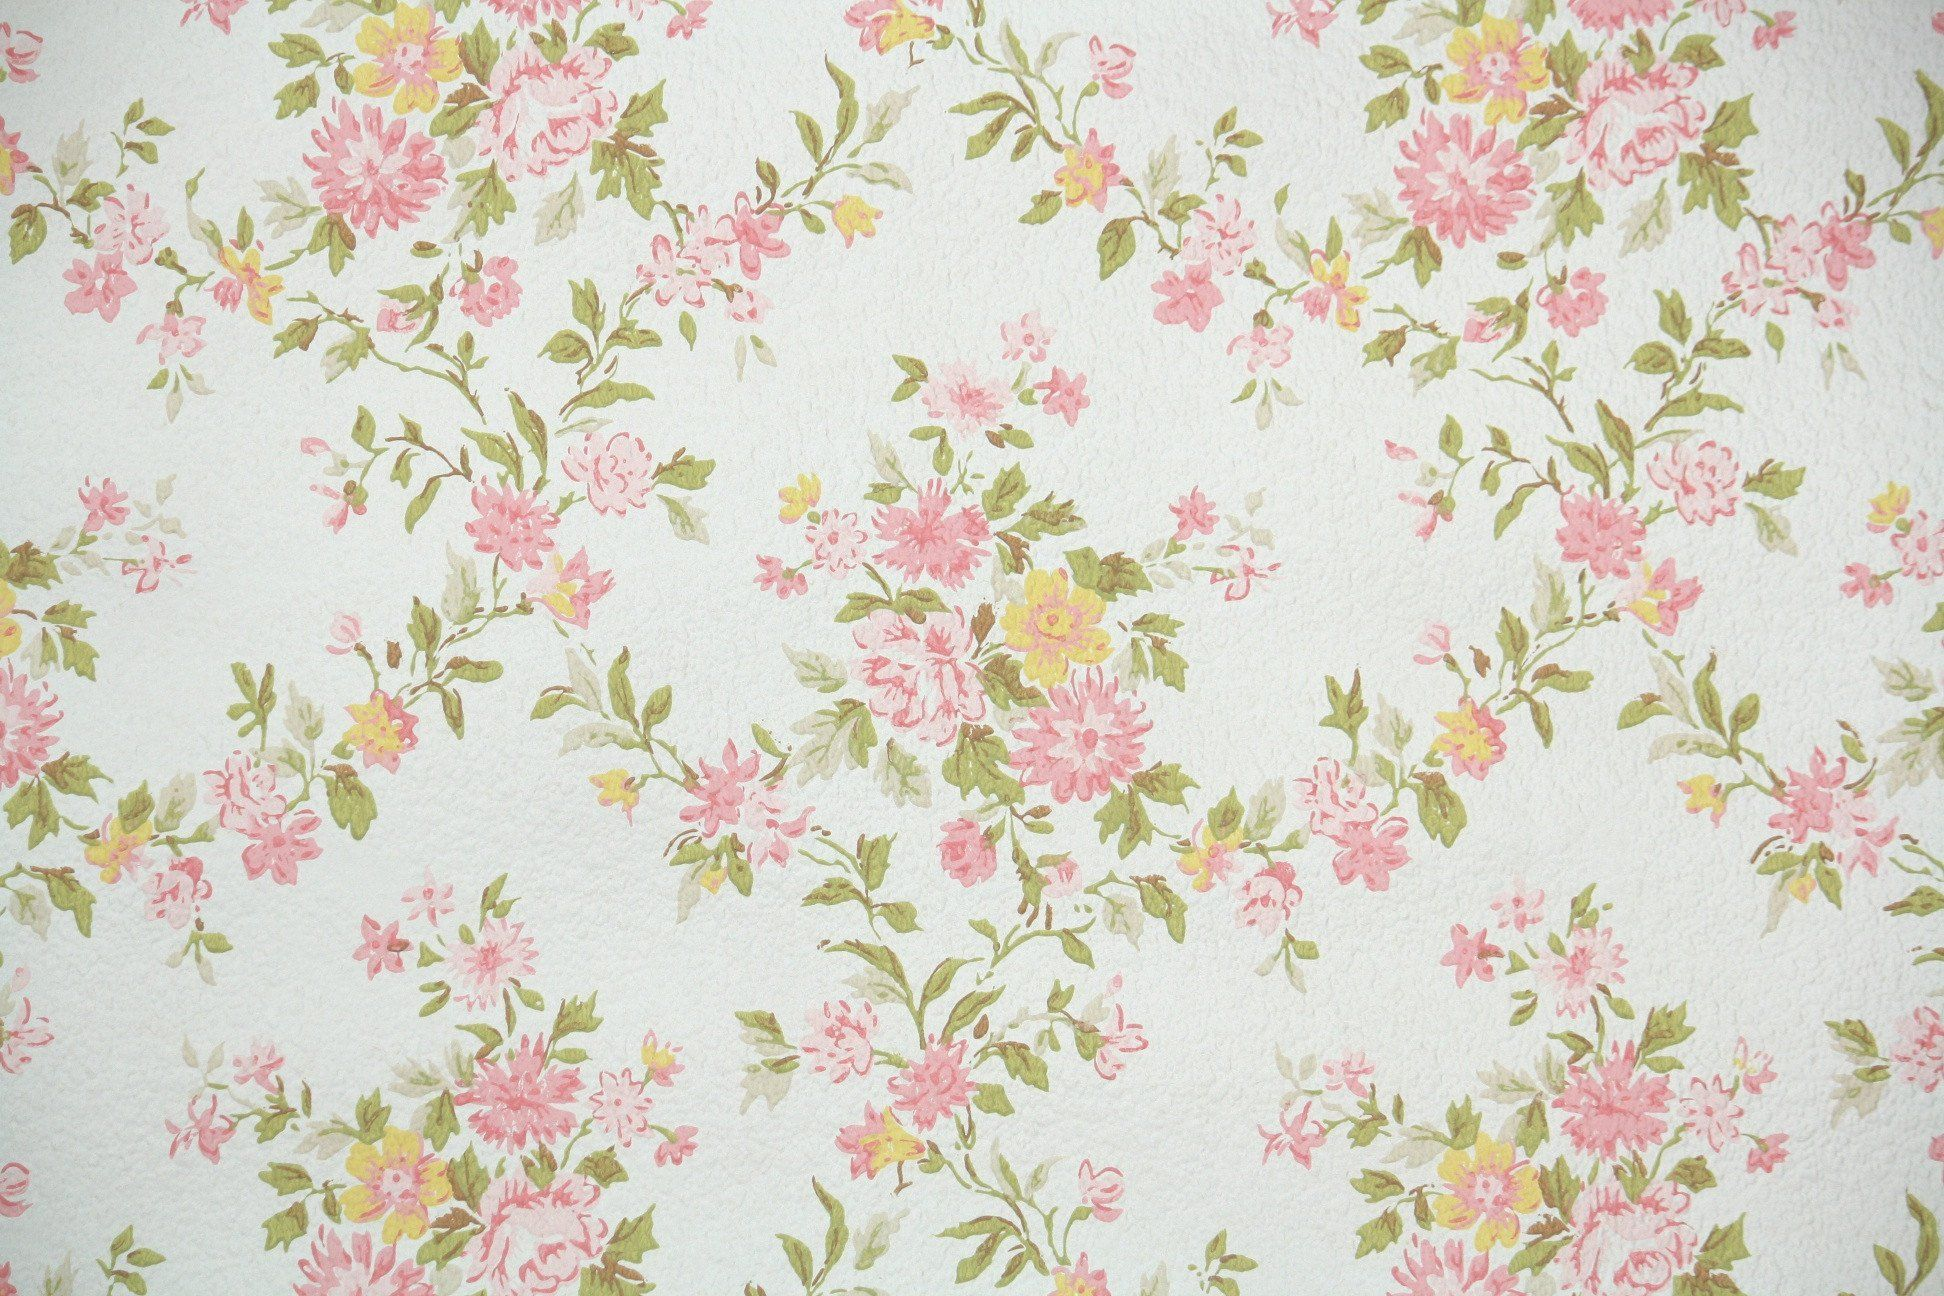 1960s Floral Vintage Wallpaper Hannah S Treasures Vintage - Floral Vintage - HD Wallpaper